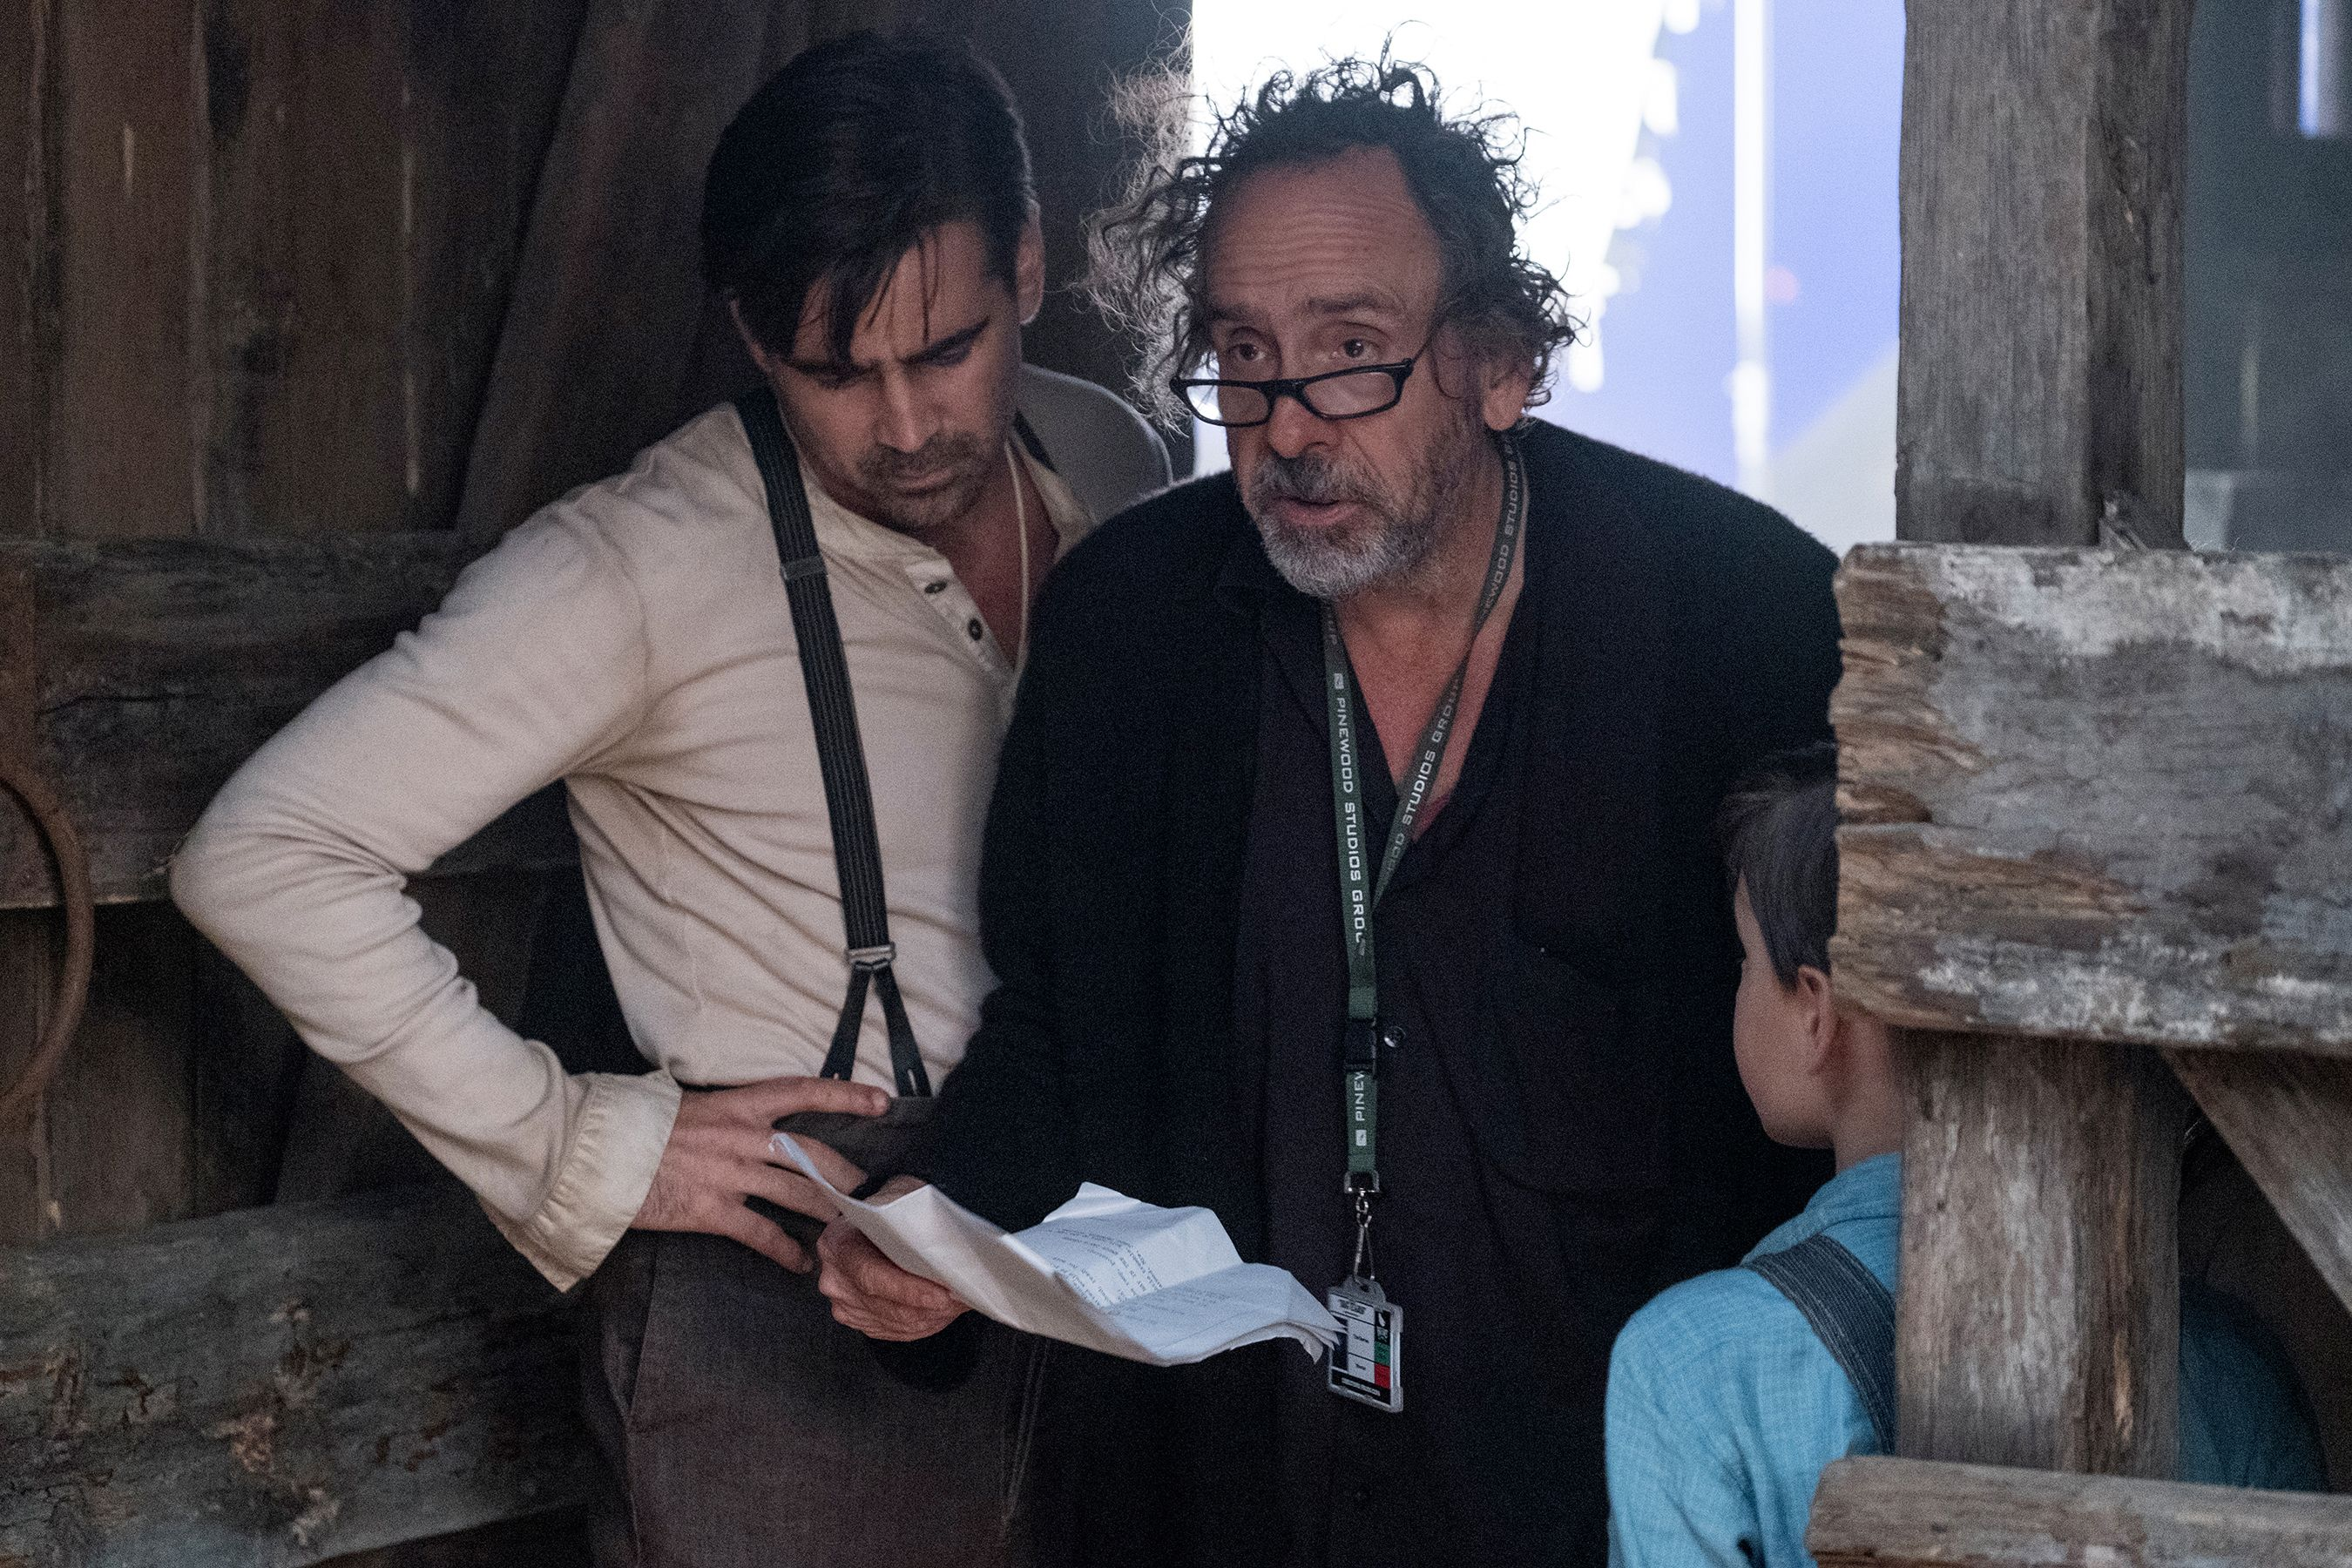 Colin Farrell on Dumbo and Tim Burton   Collider